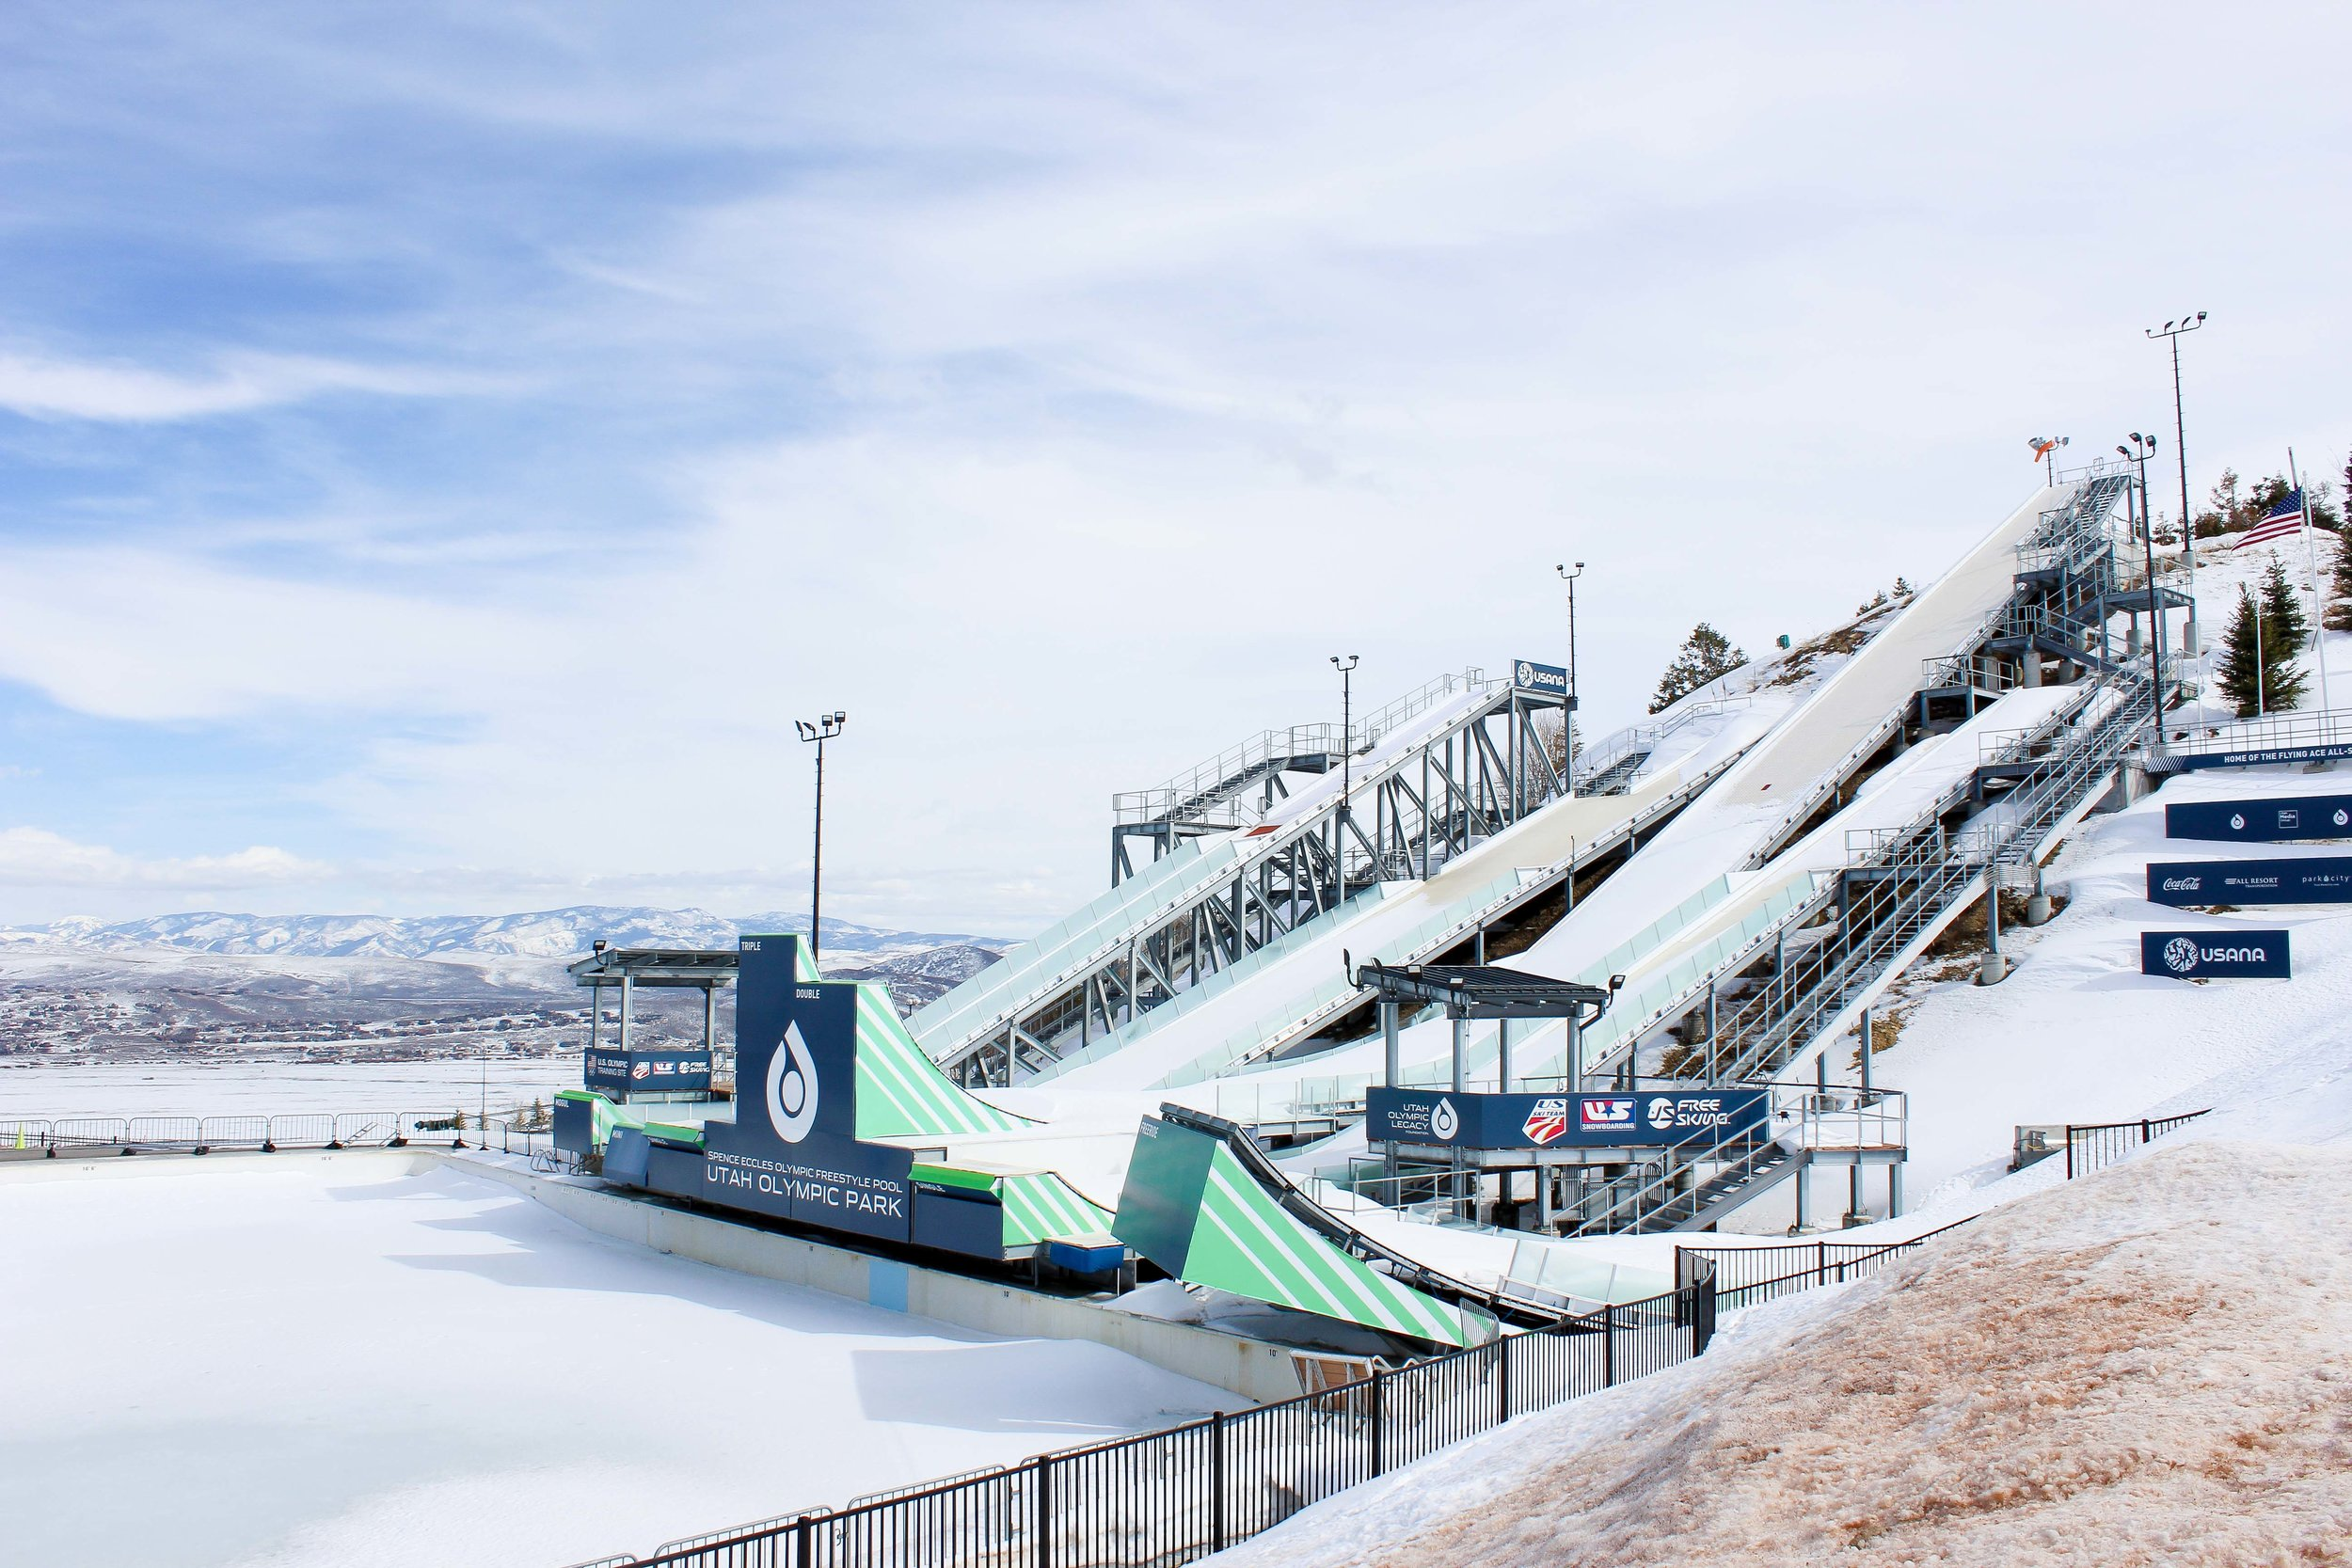 skiJump-1.jpg